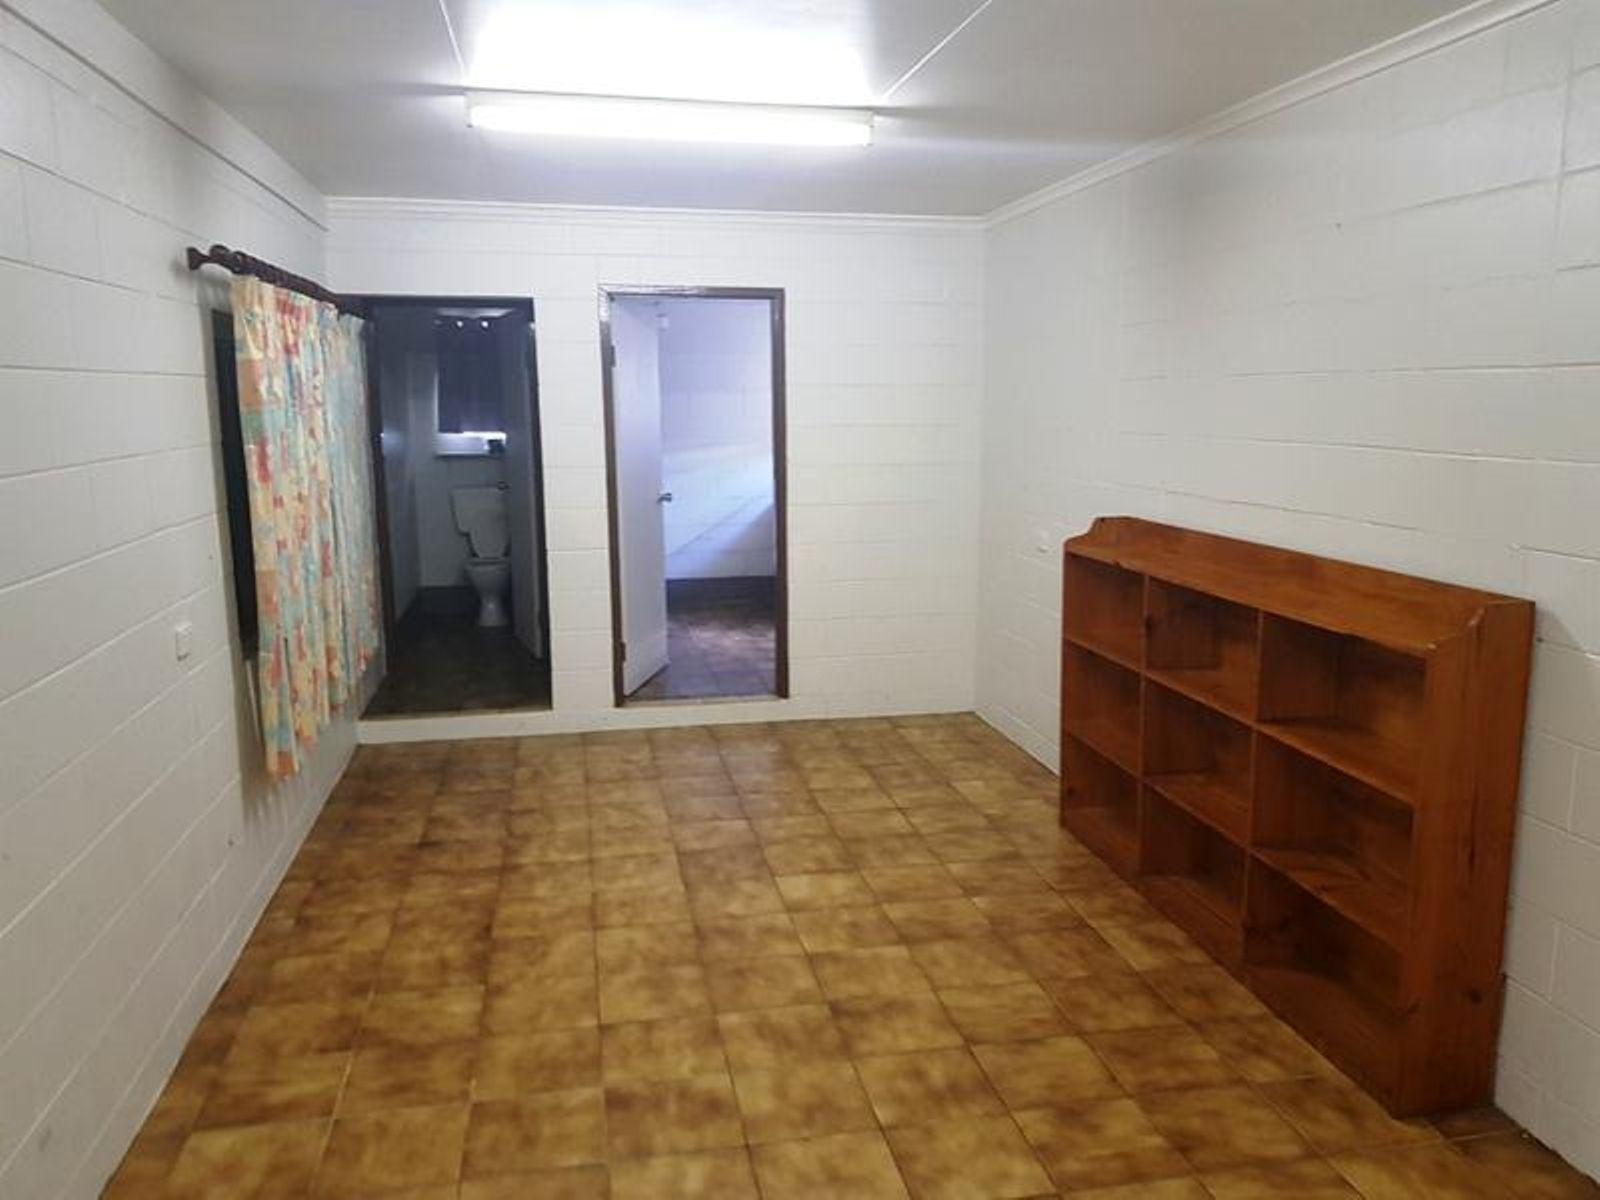 54 GLADY Street, Innisfail, QLD 4860